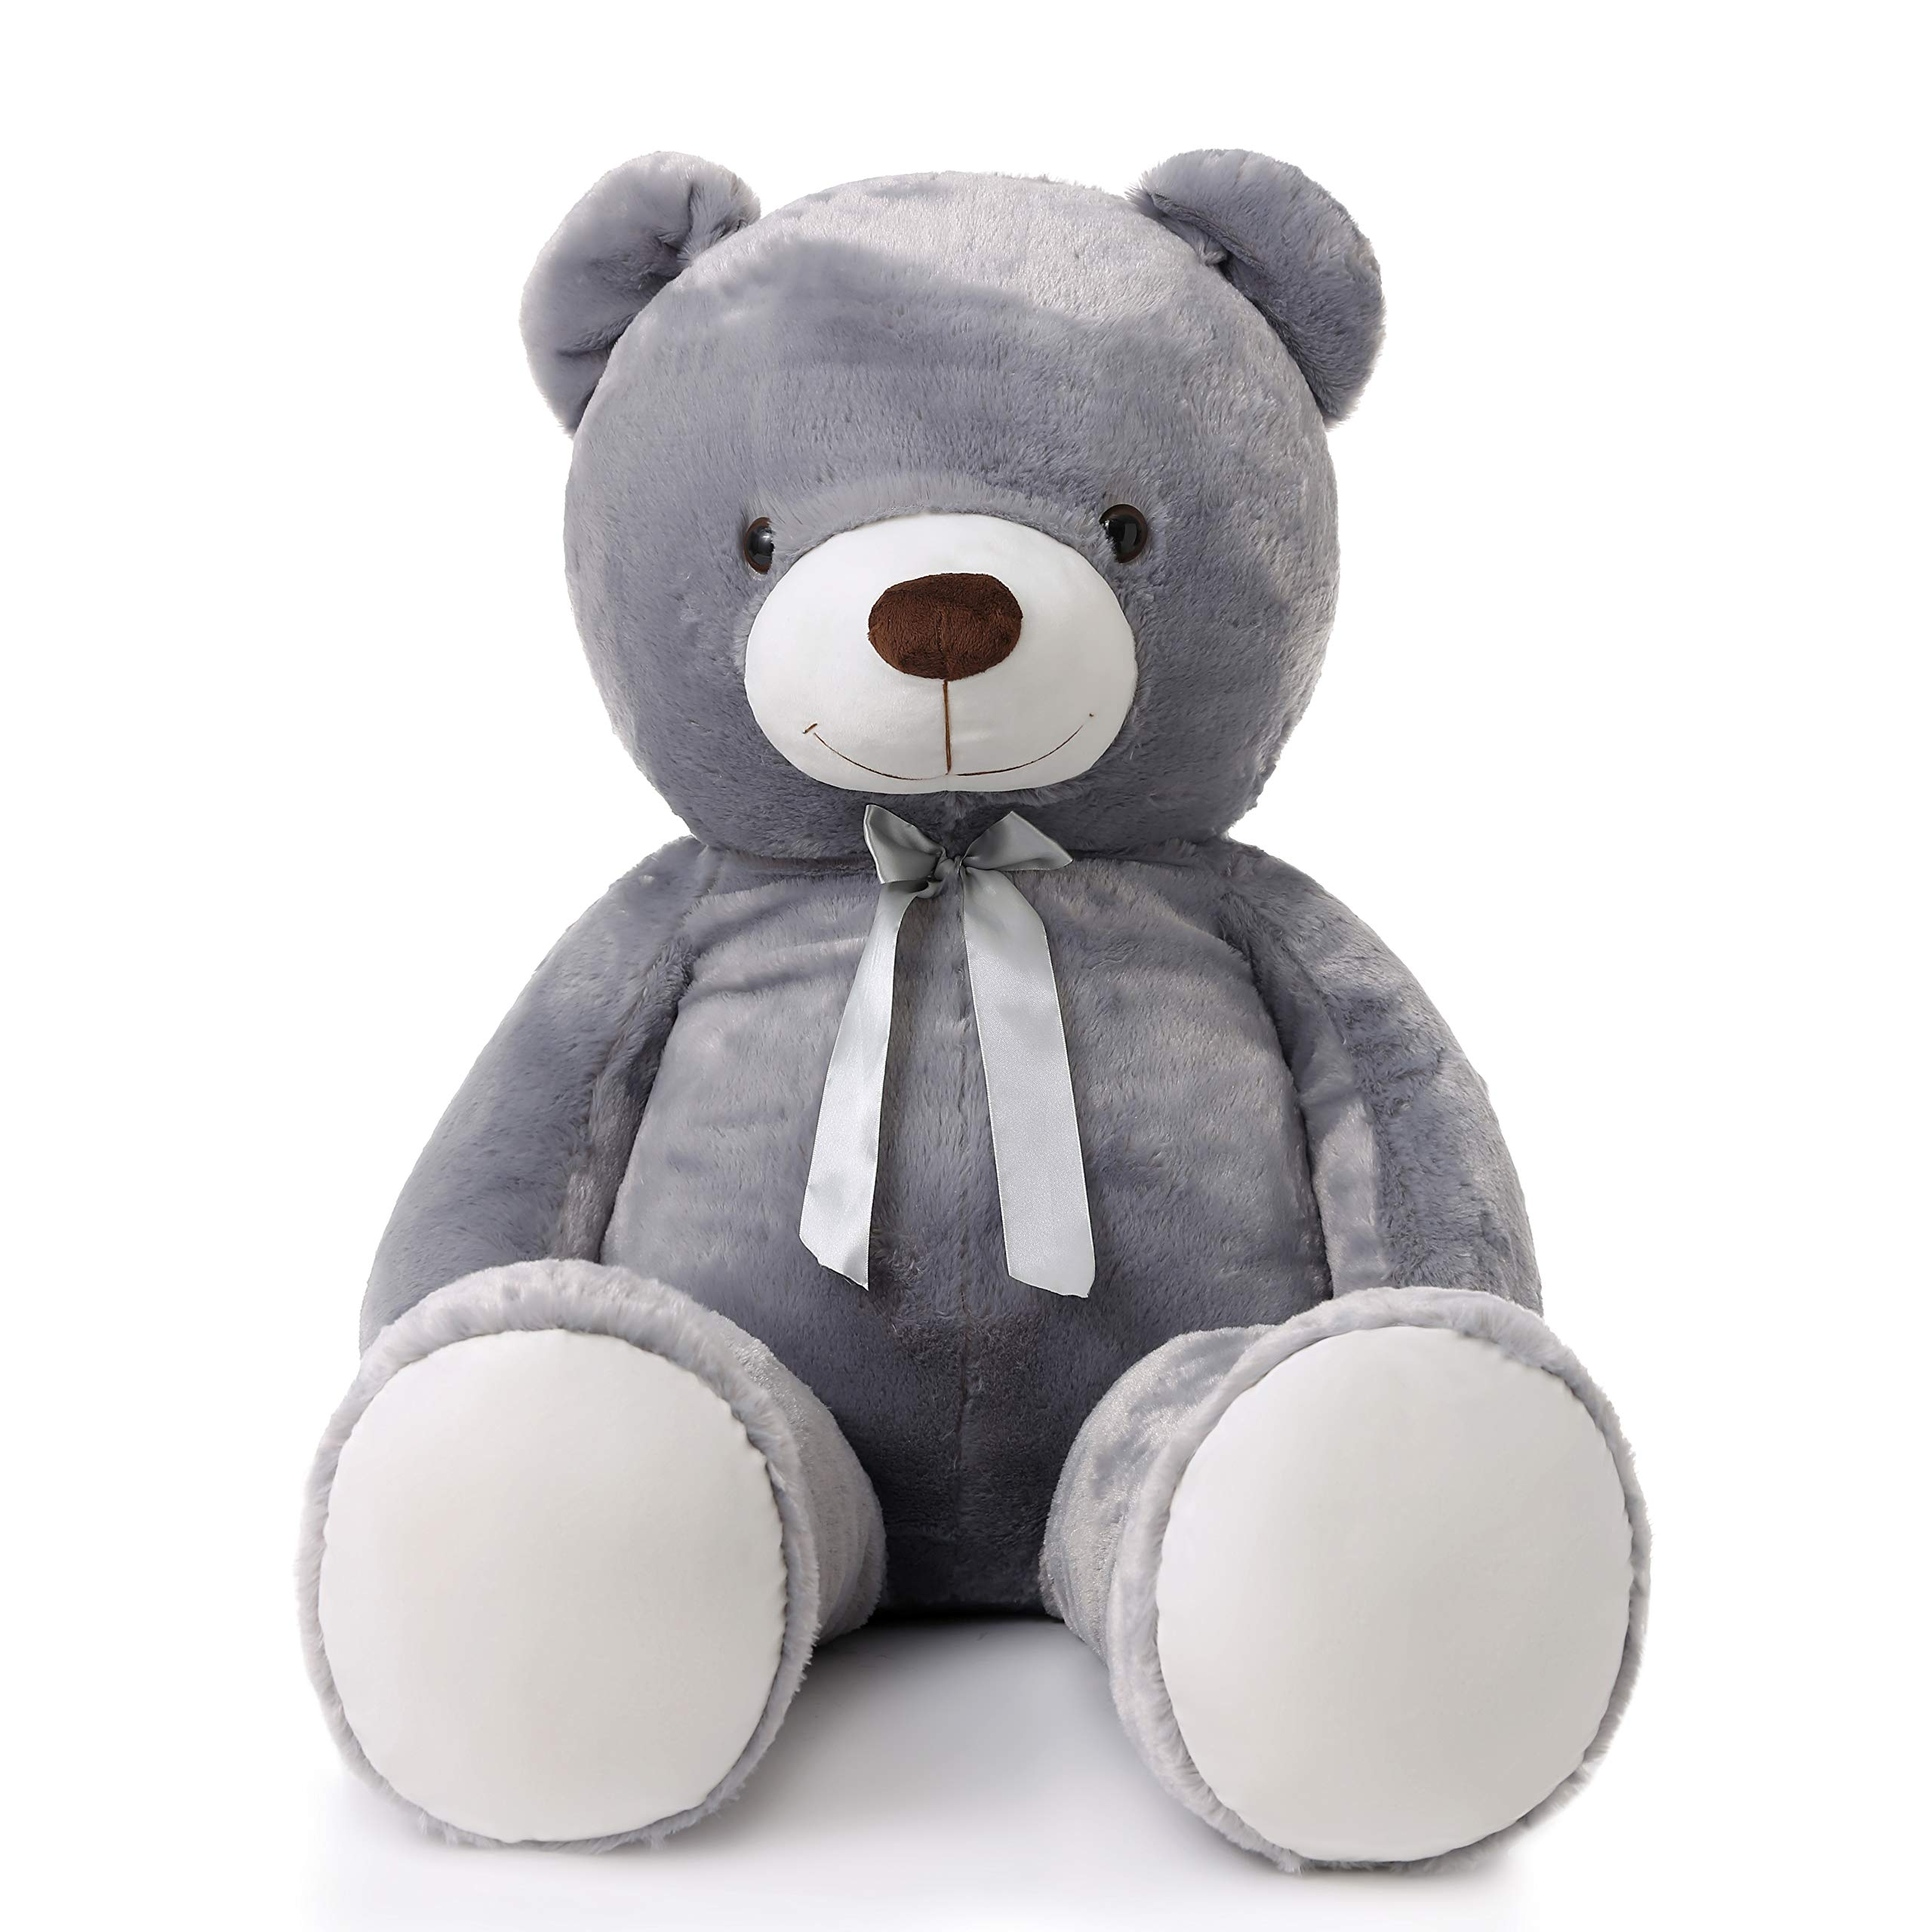 MorisMos Giant Teddy Bear Stuffed Animals Plush Toy for Girlfriend Kids (Gray, 47 Inch) by MorisMos